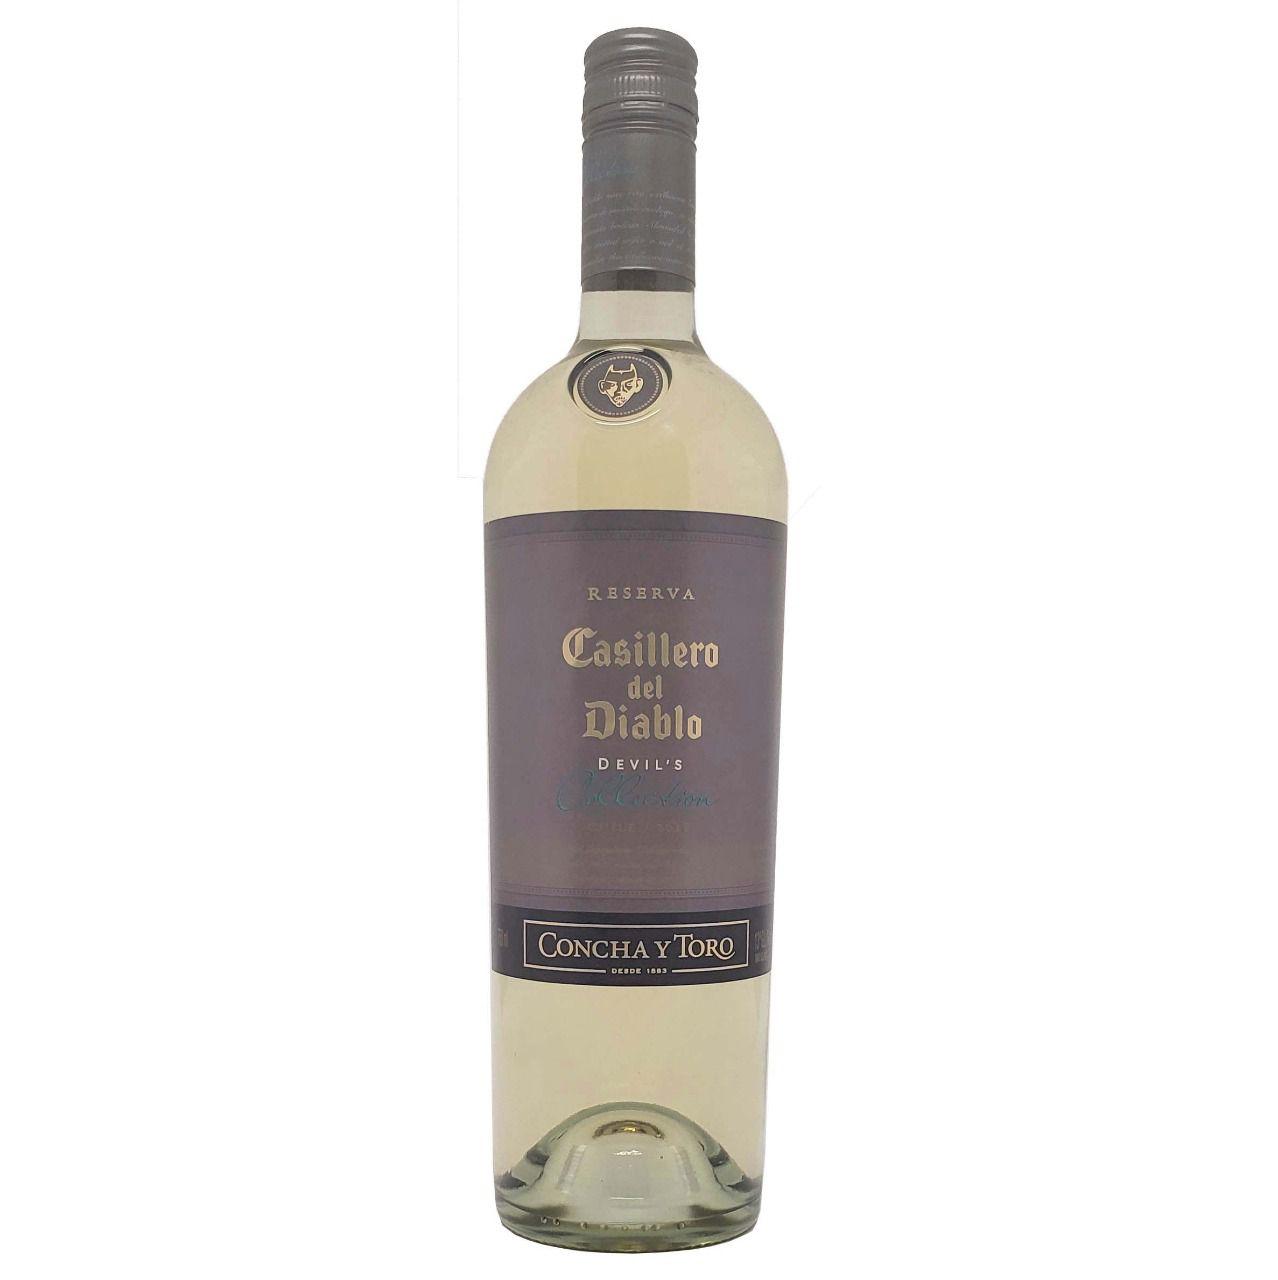 Vinho Branco Reserva Devil's Collection Casillero del Diablo  - 750ml -